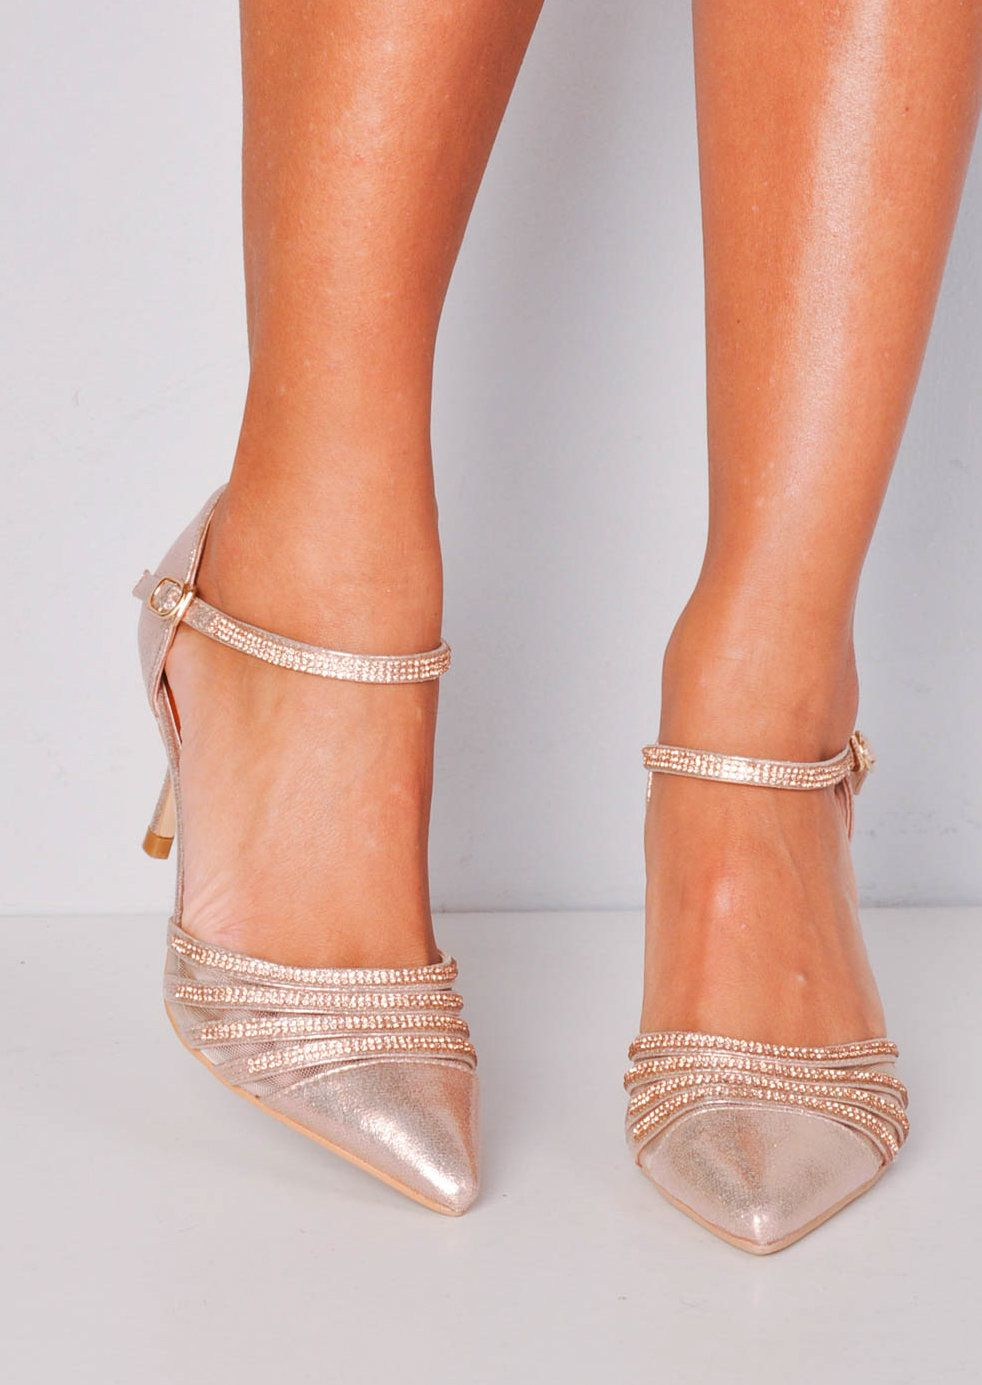 Diamante Mesh Embellished Kitten Court Heels Rose Gold Gold Kitten Heels Kitten Heels Wedding Jeweled Shoes